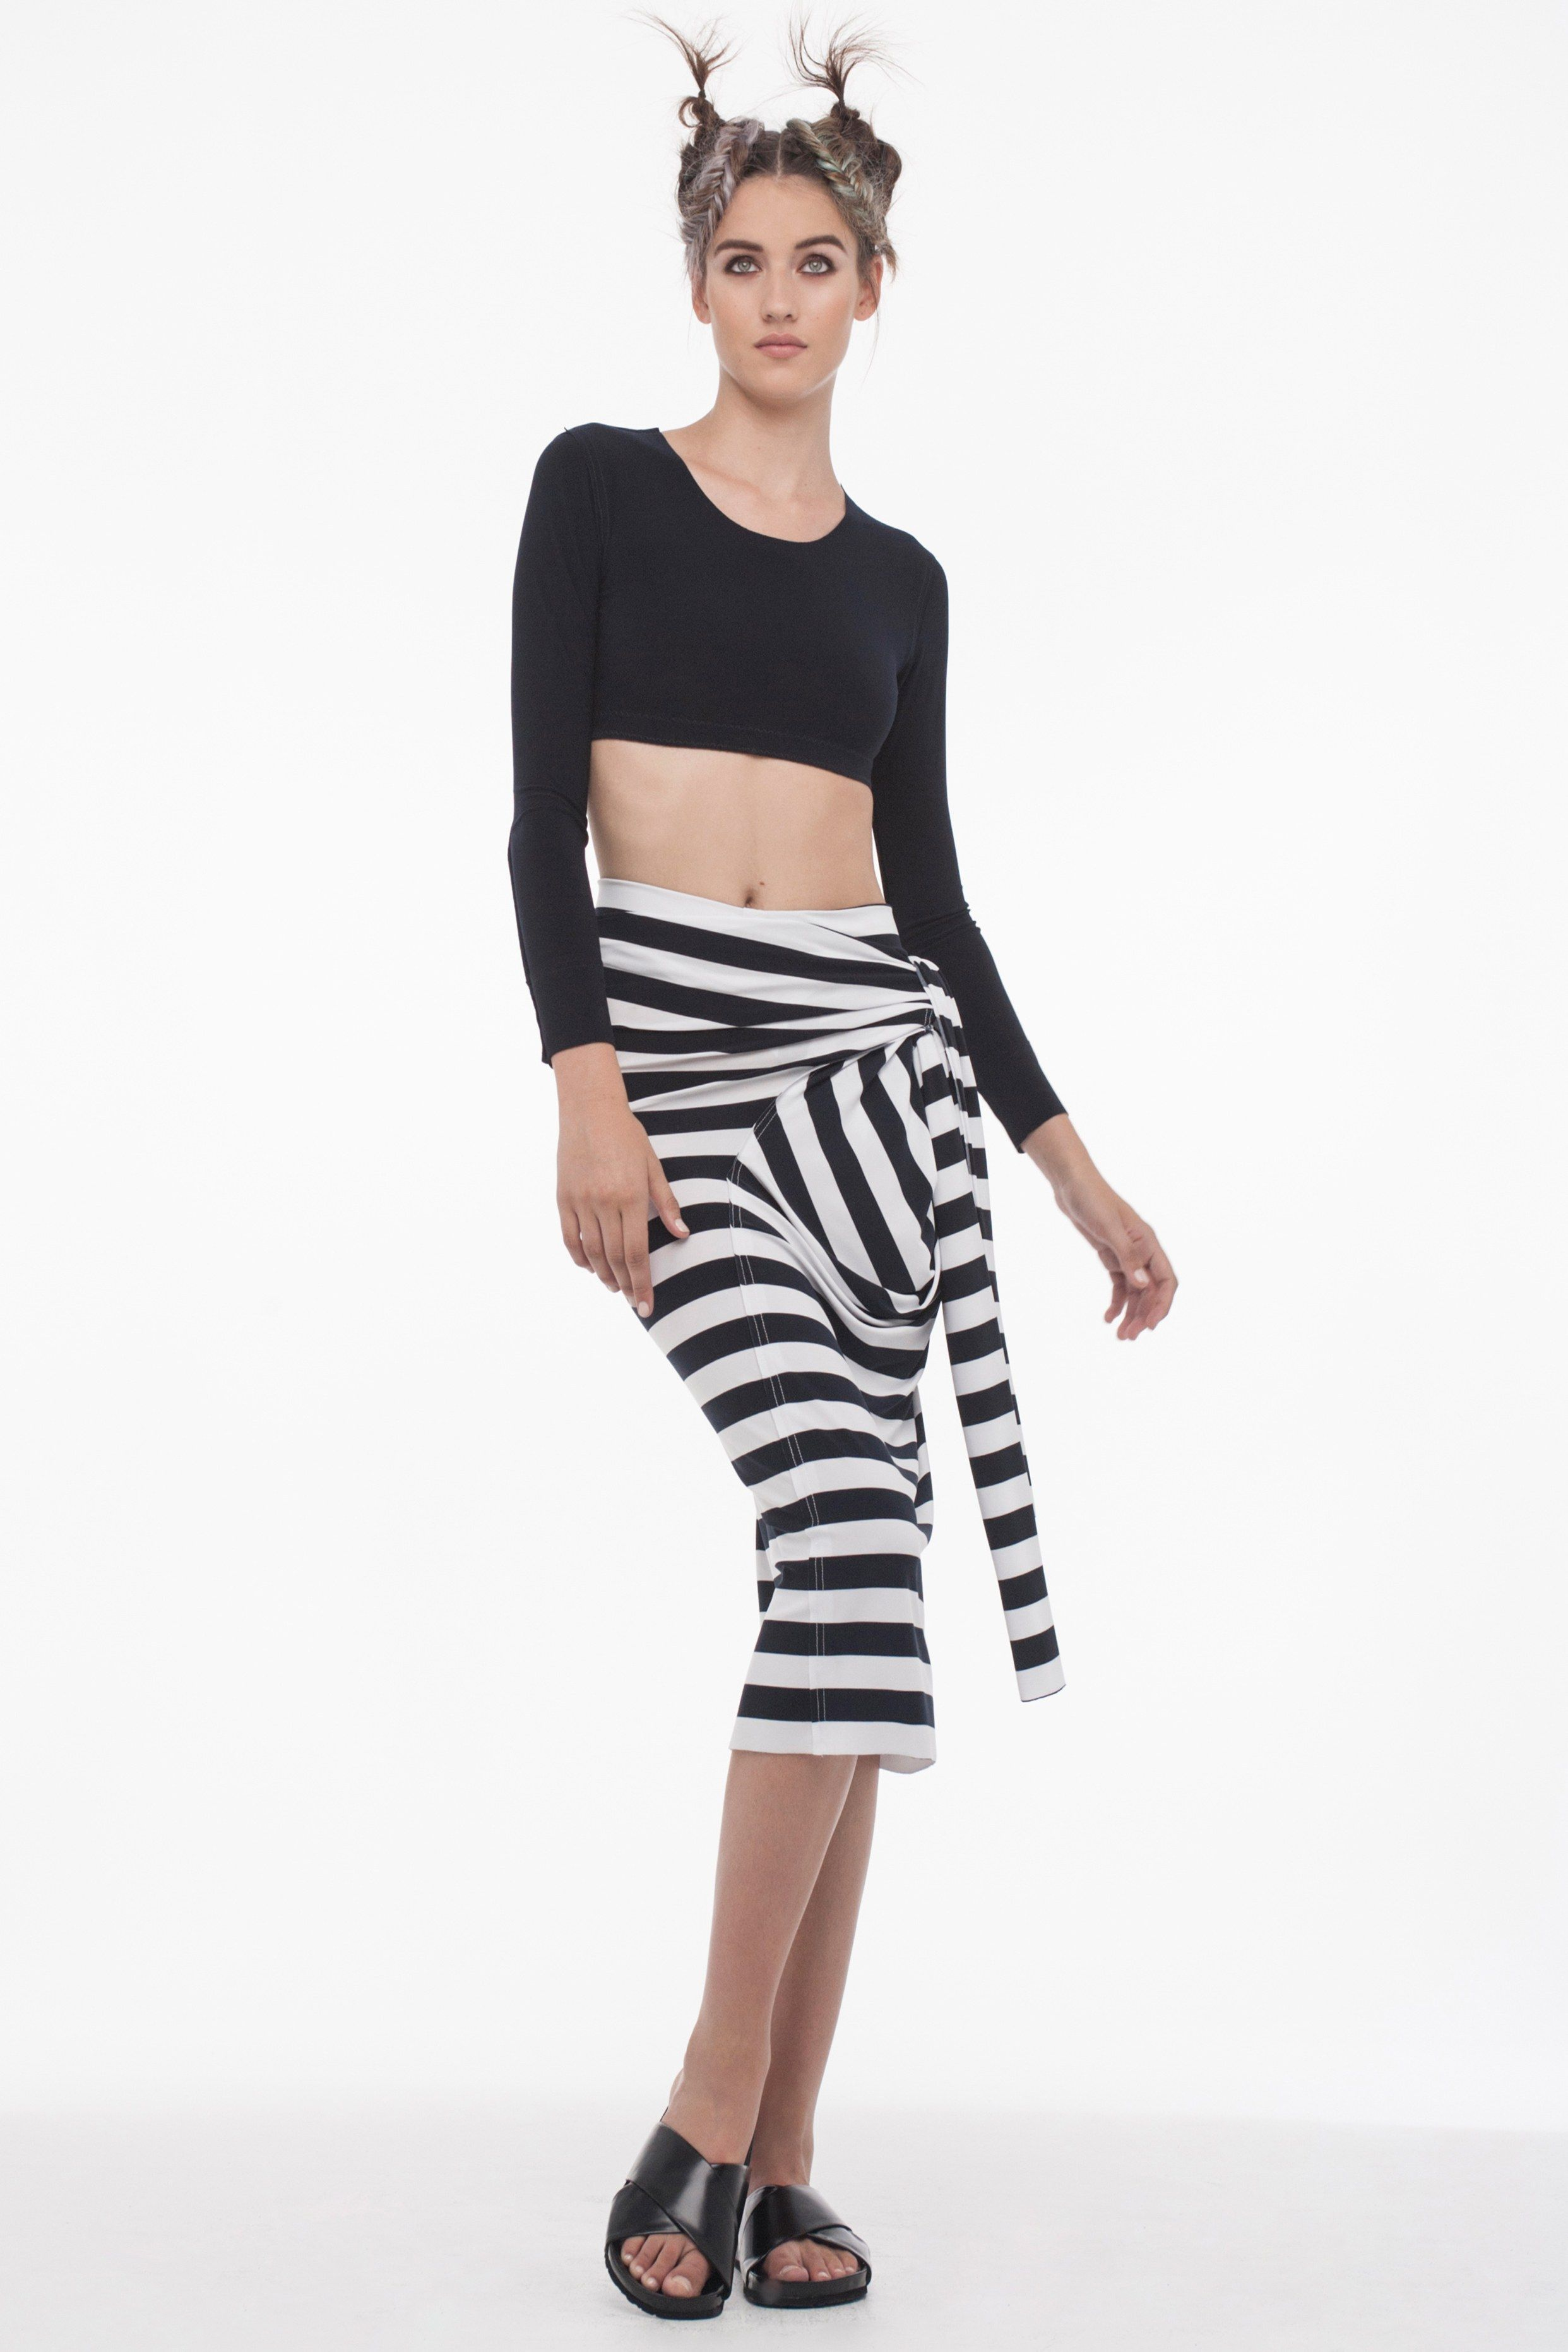 Norma Kamali Spring 2016 Ready-to-Wear Fashion Show